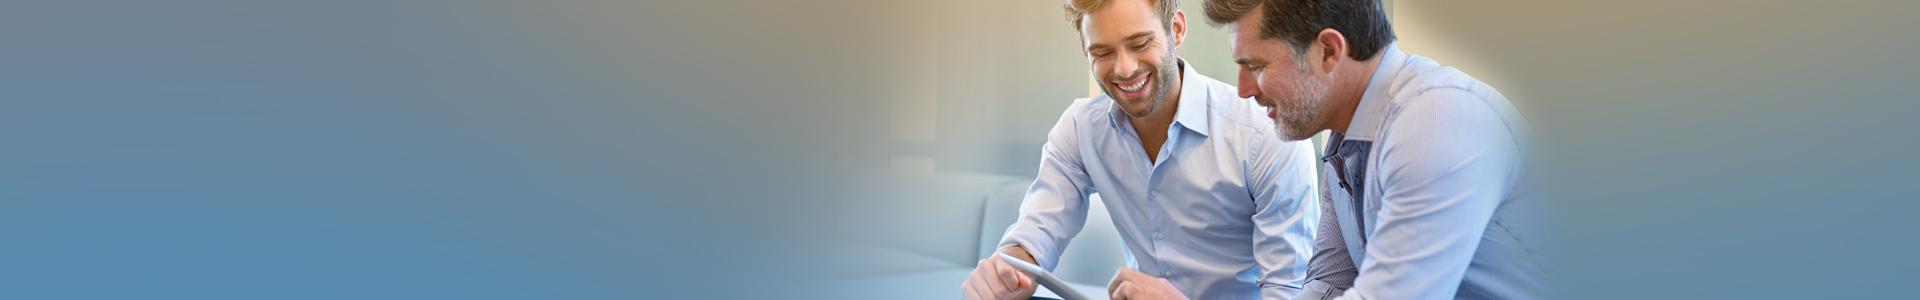 Find Strategic Digital Marketing & SEO Optimisation Company